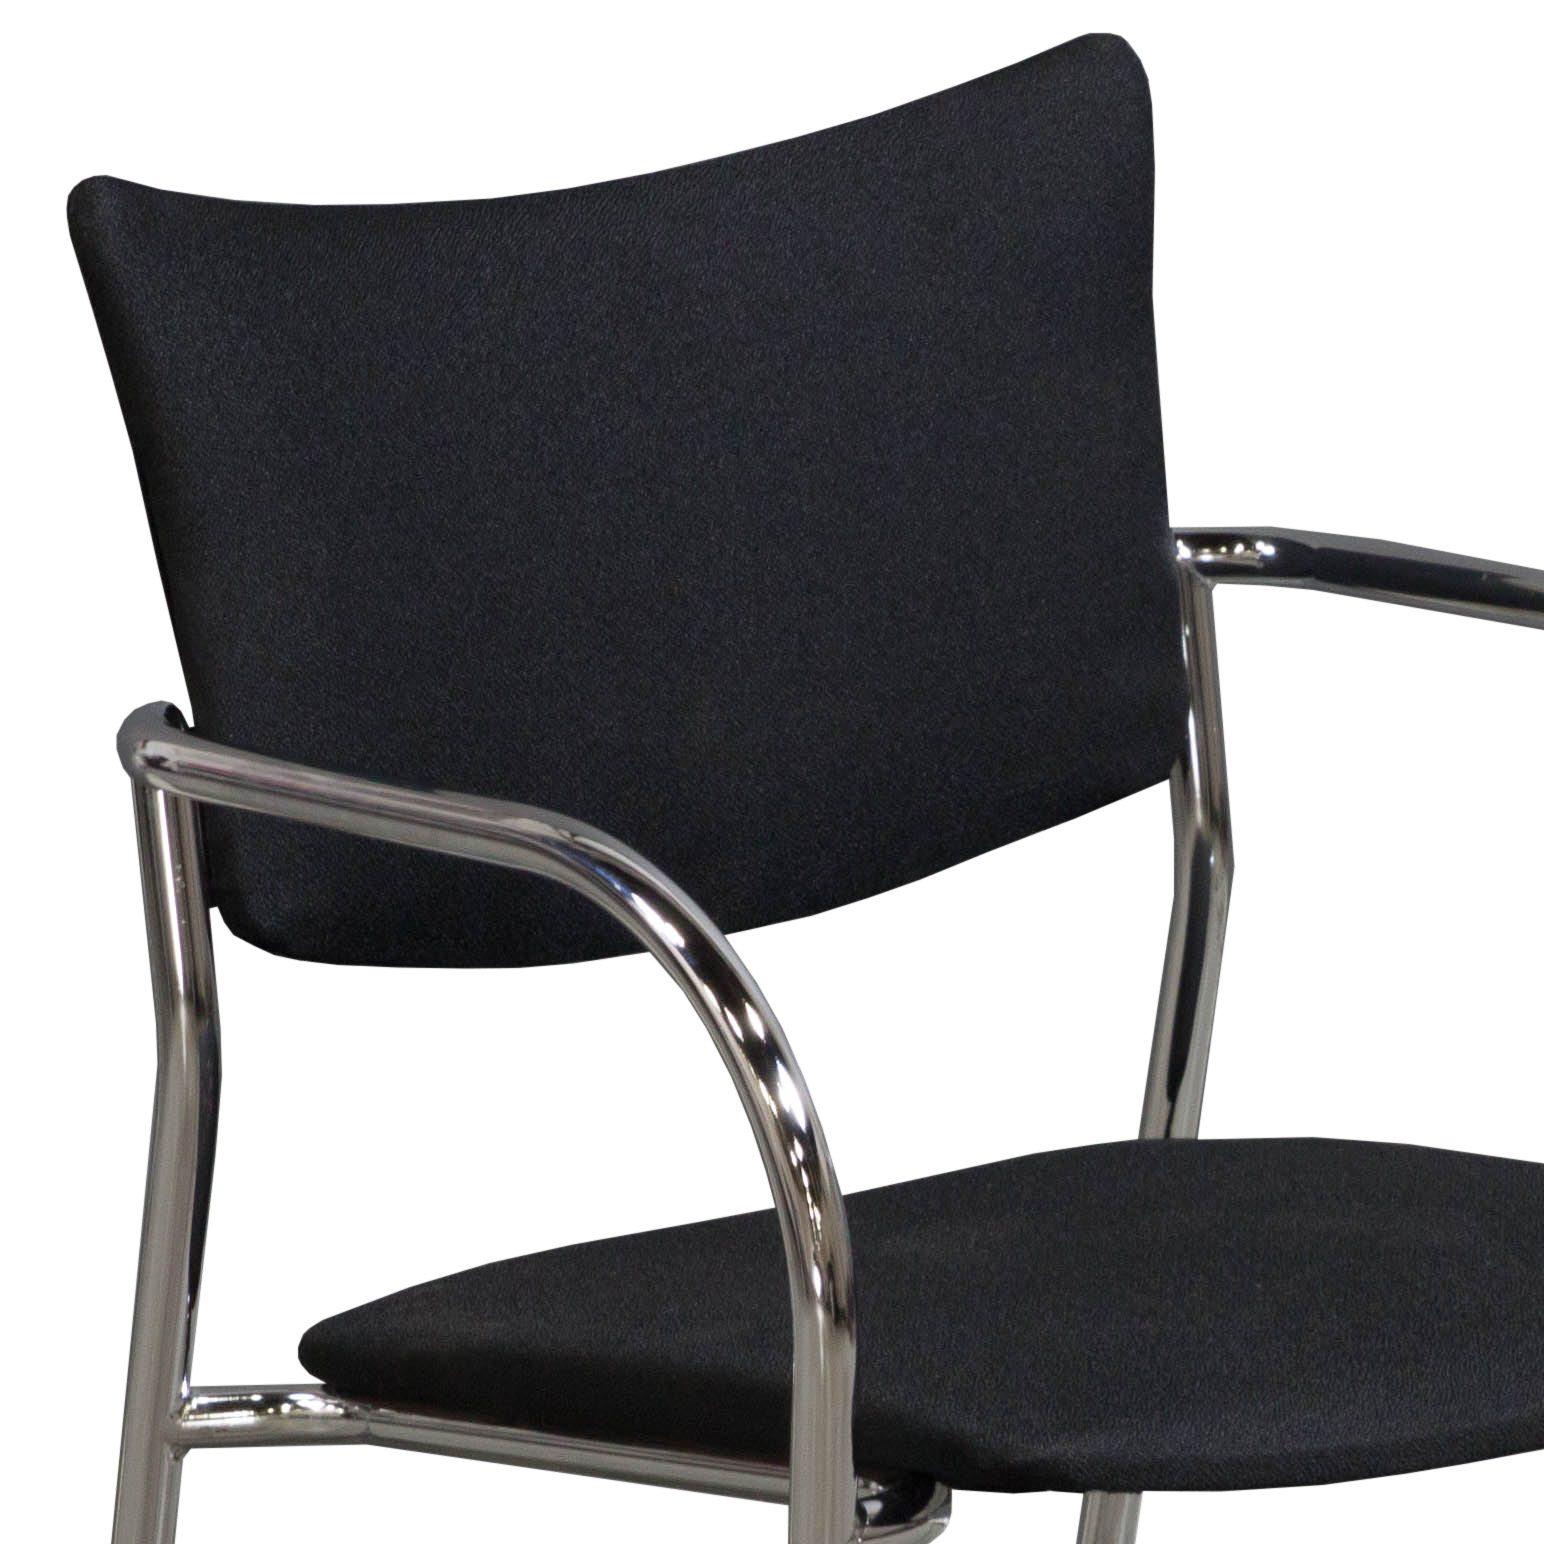 Versteel Companion in Black Fabric - Arm